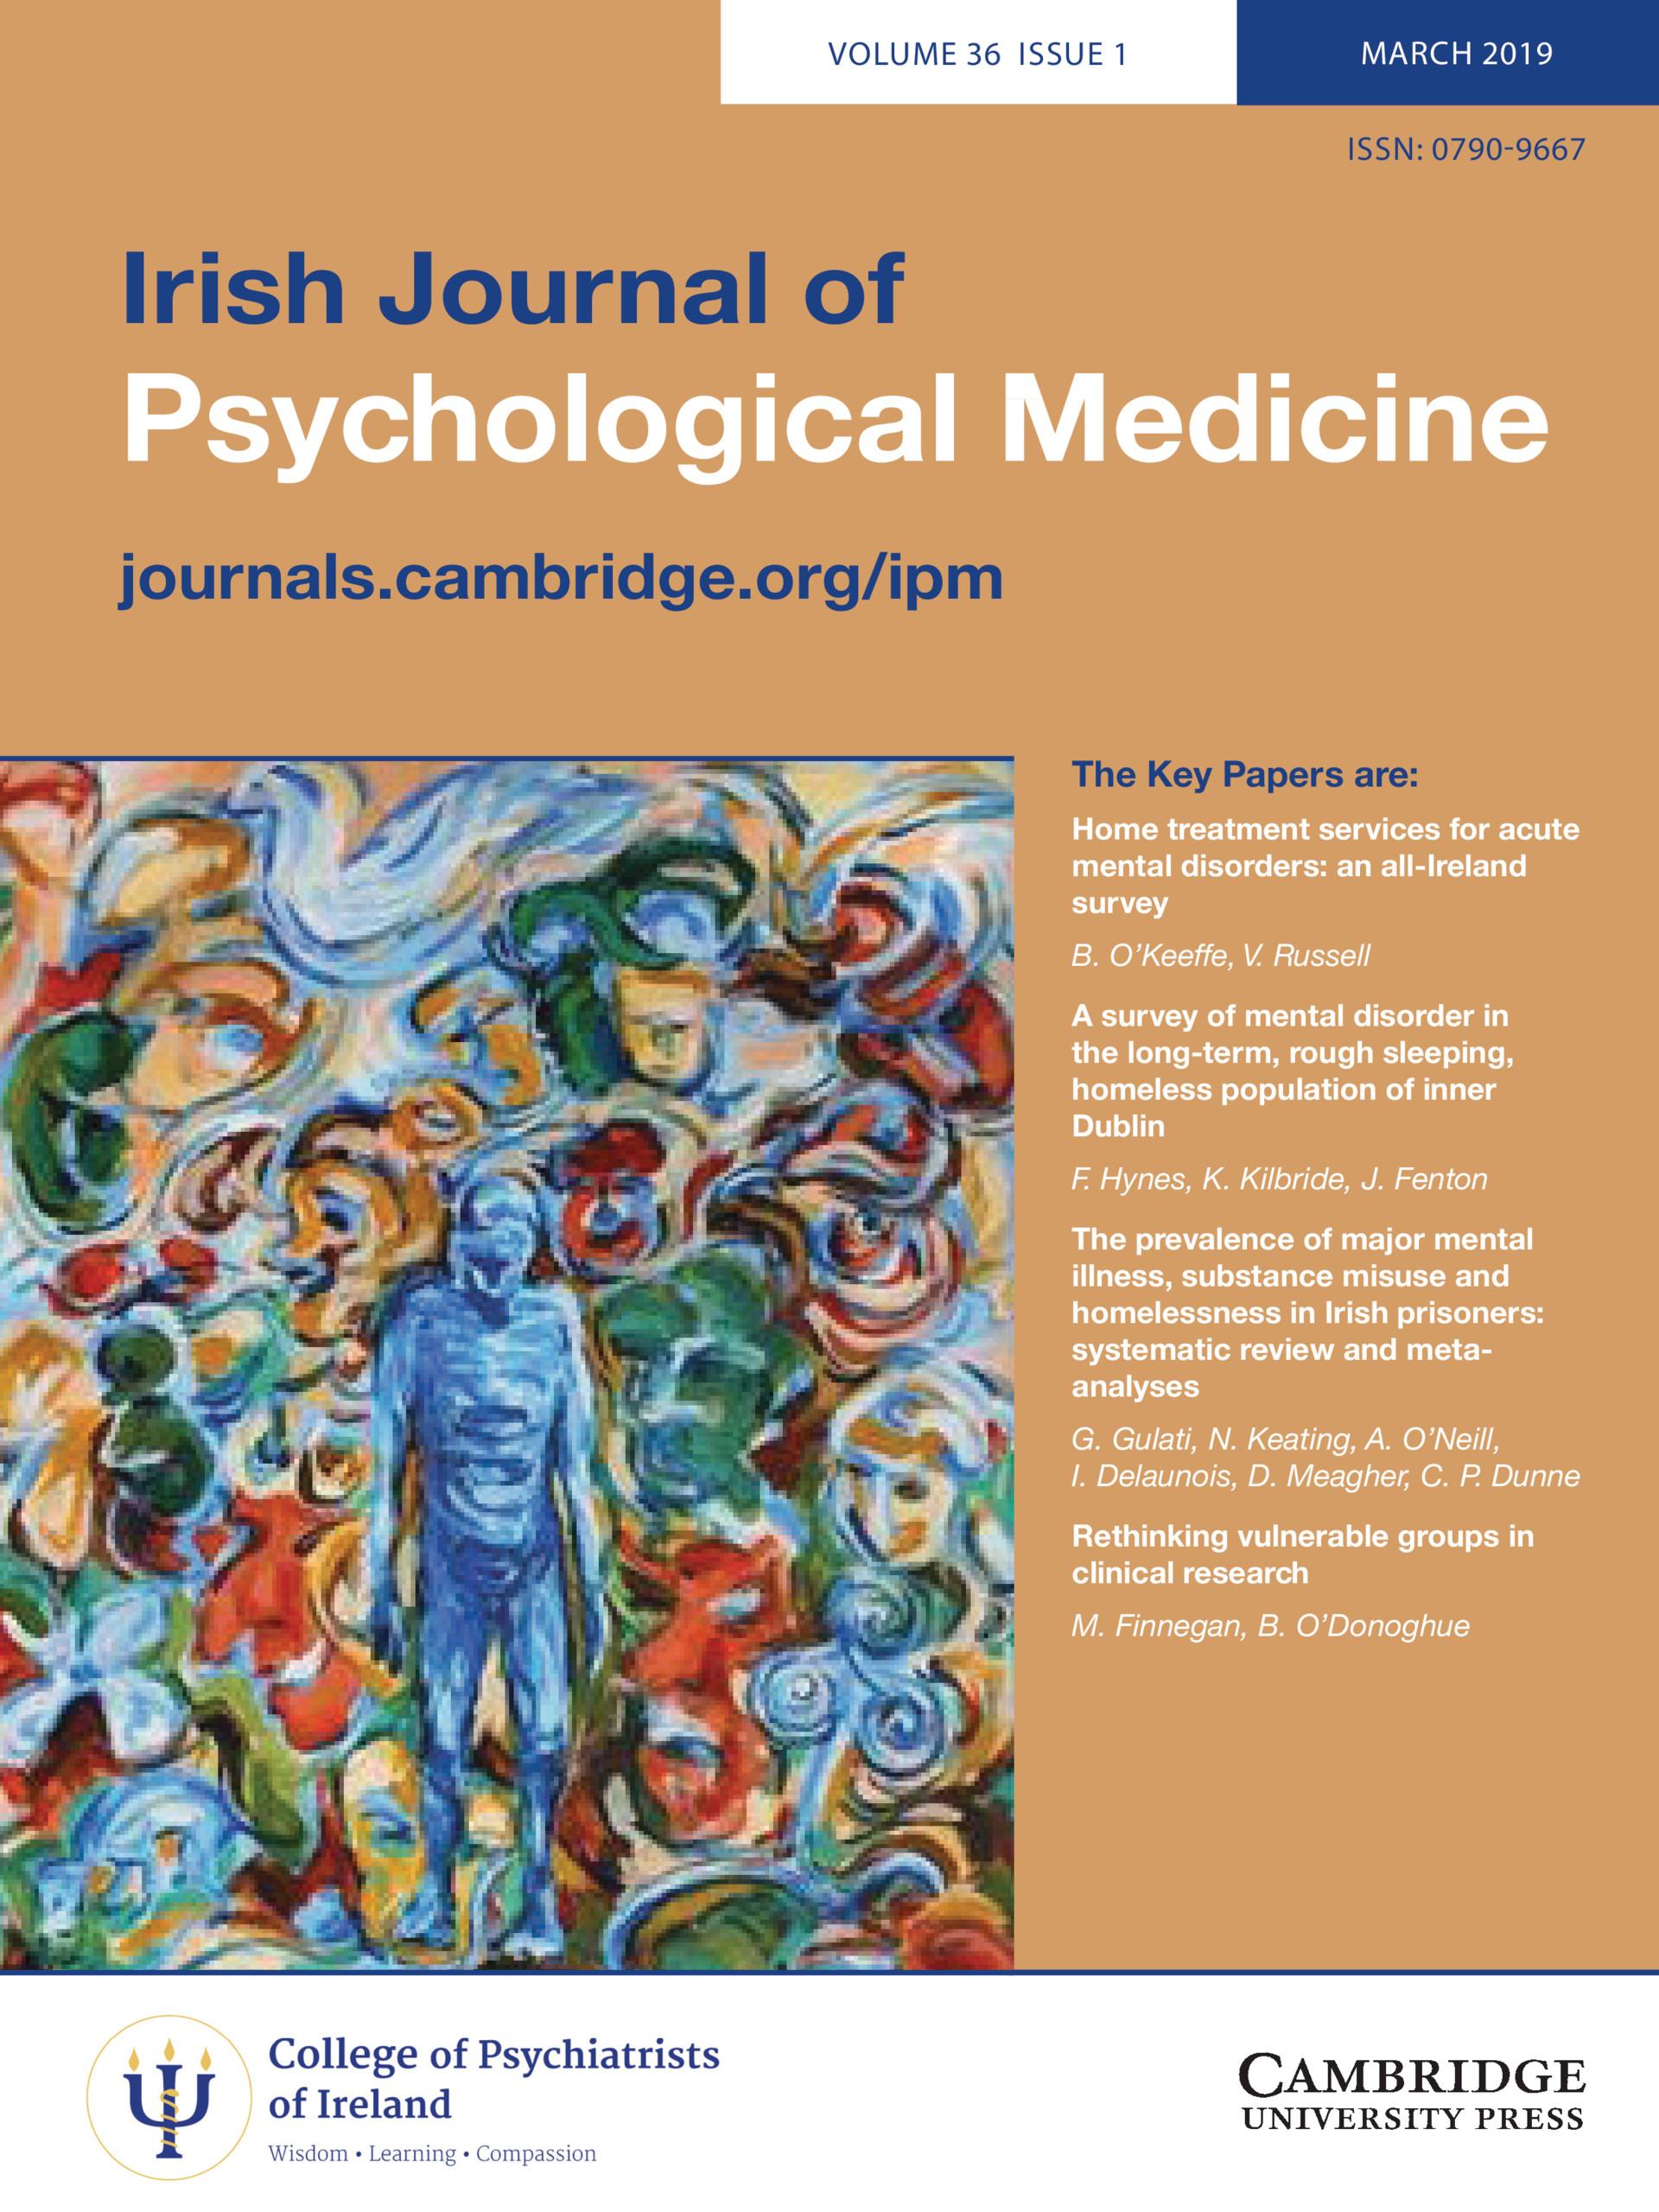 Irish Journal of Psychological Medicine: Volume 36 - Issue 1